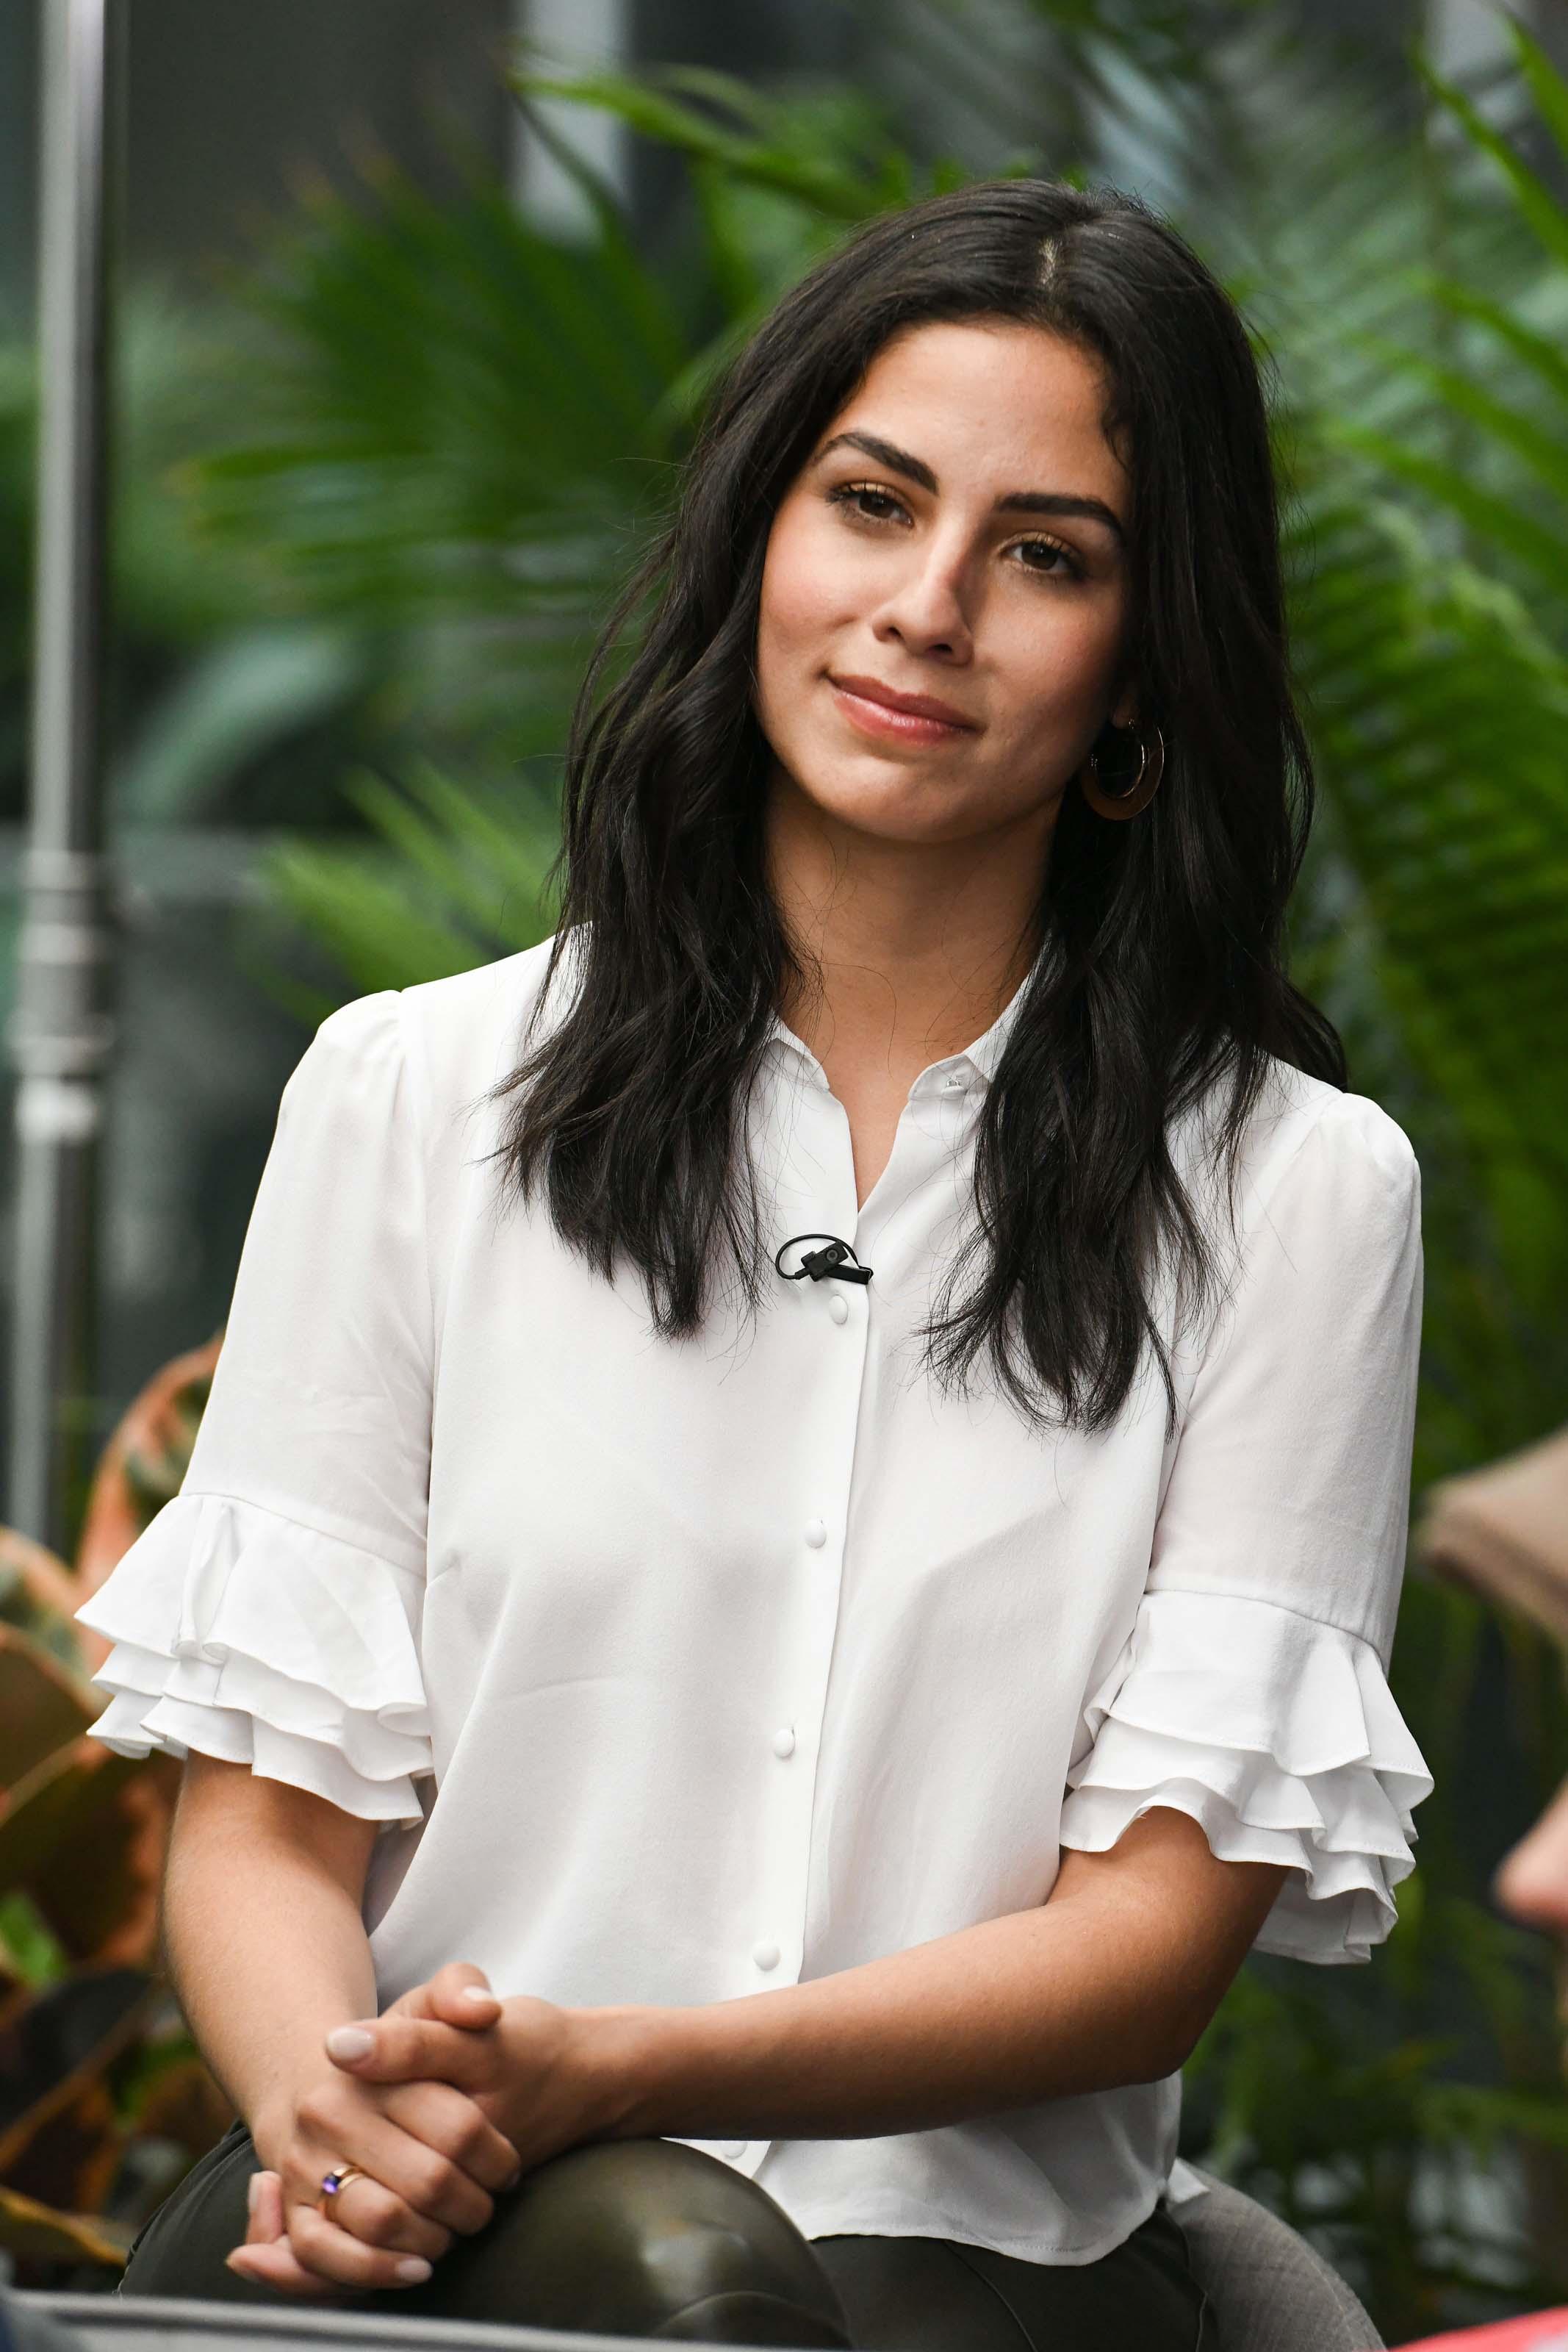 Isabel Arraiza attends Variety Studio